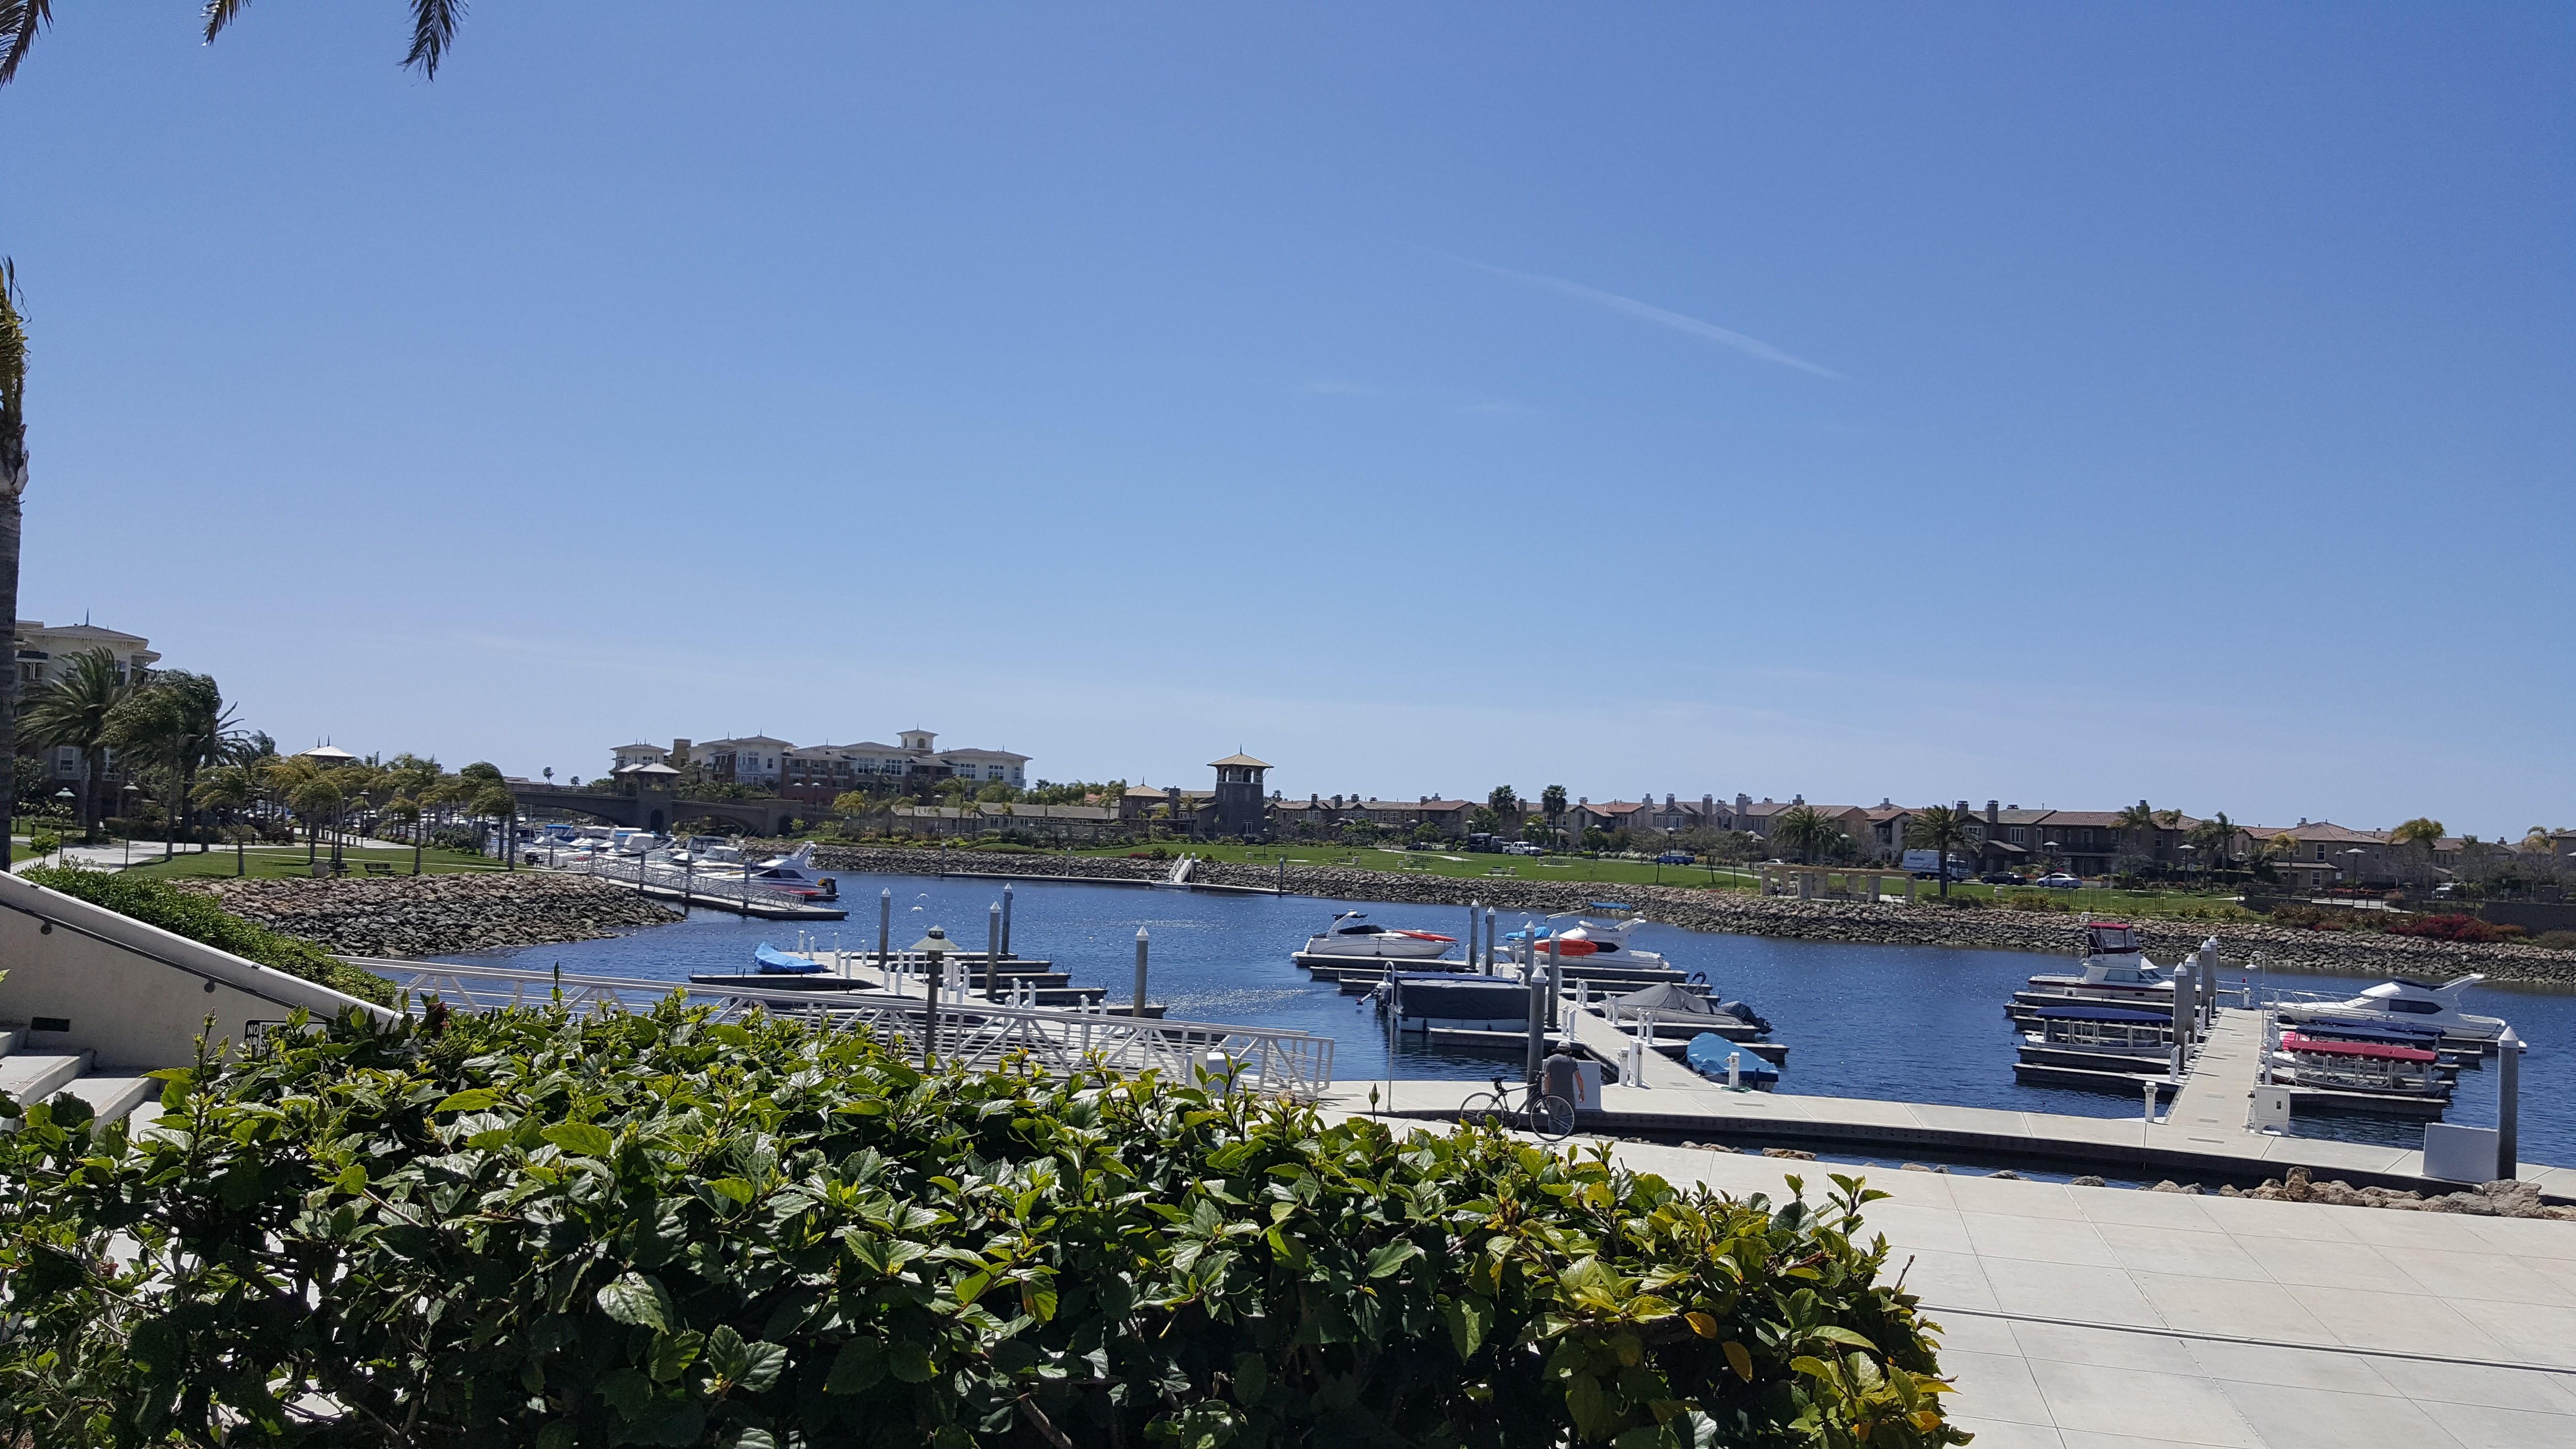 Oxnard Marina and Seabridge Marketplace in Oxnard CA